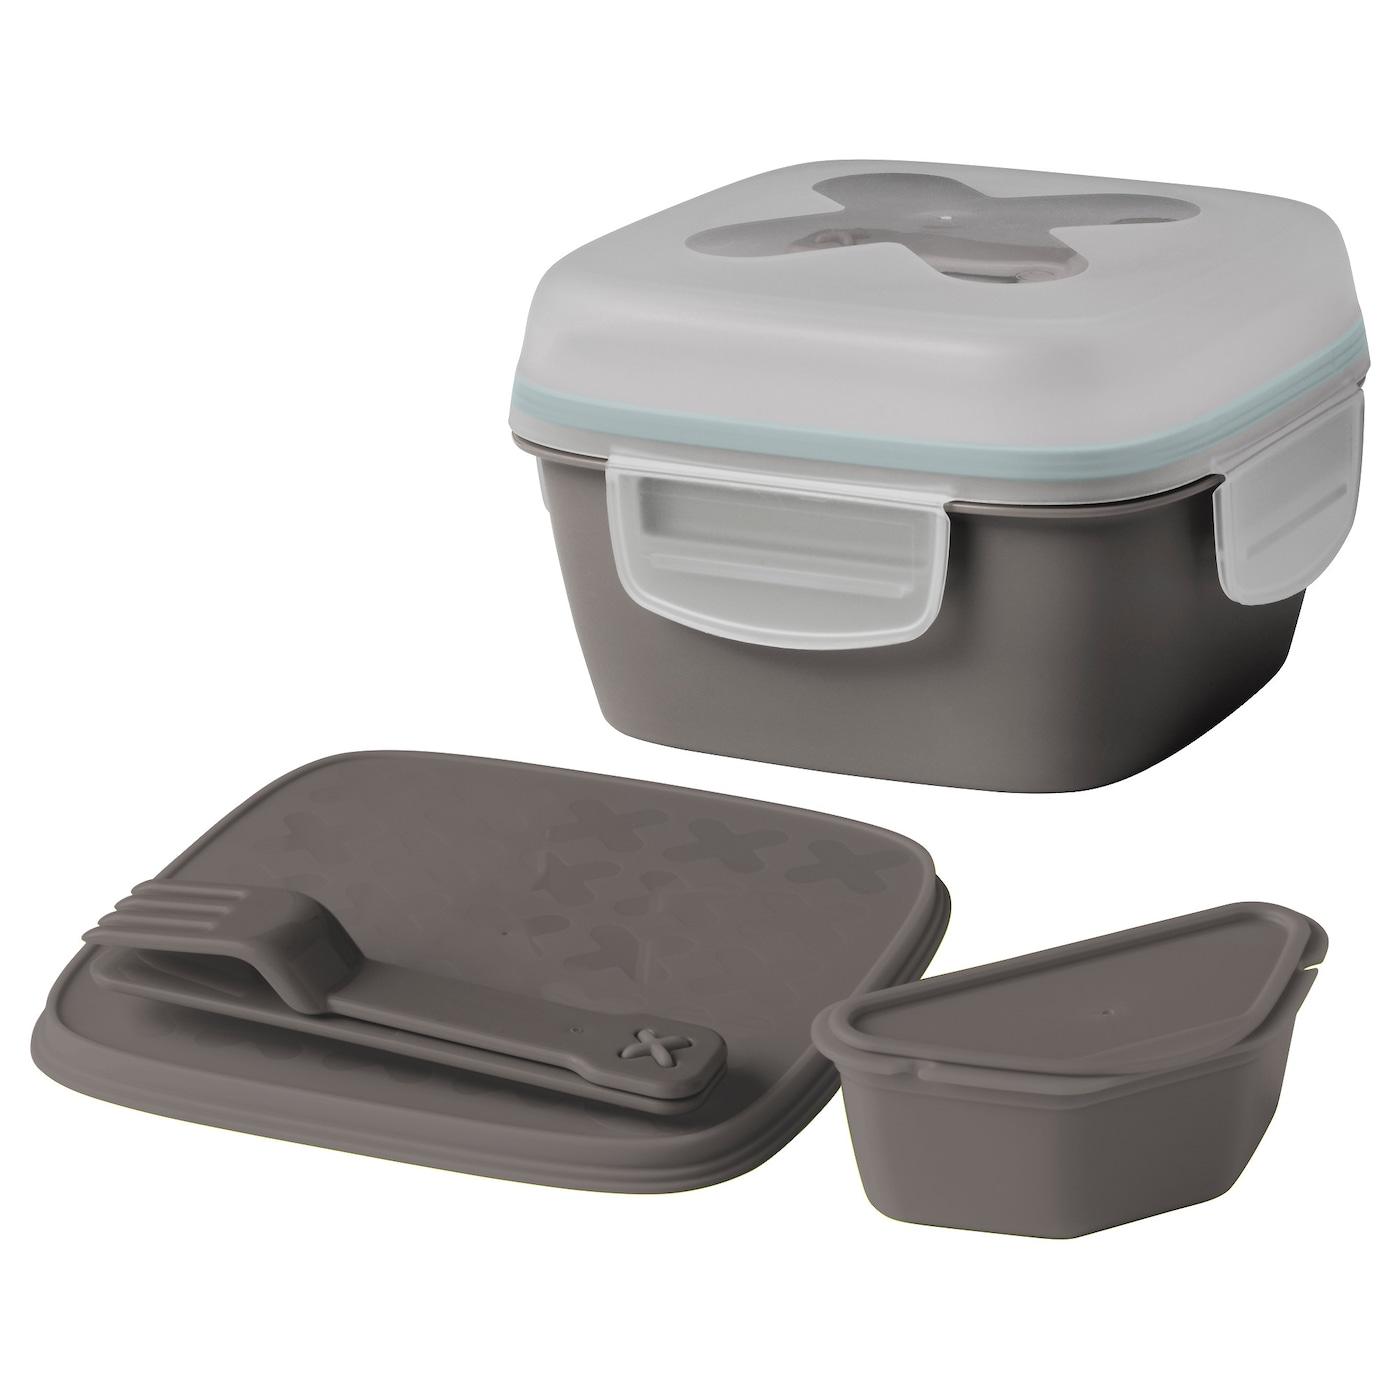 blandning lunch box for salad grey 17 x 17 x 11 cm ikea. Black Bedroom Furniture Sets. Home Design Ideas